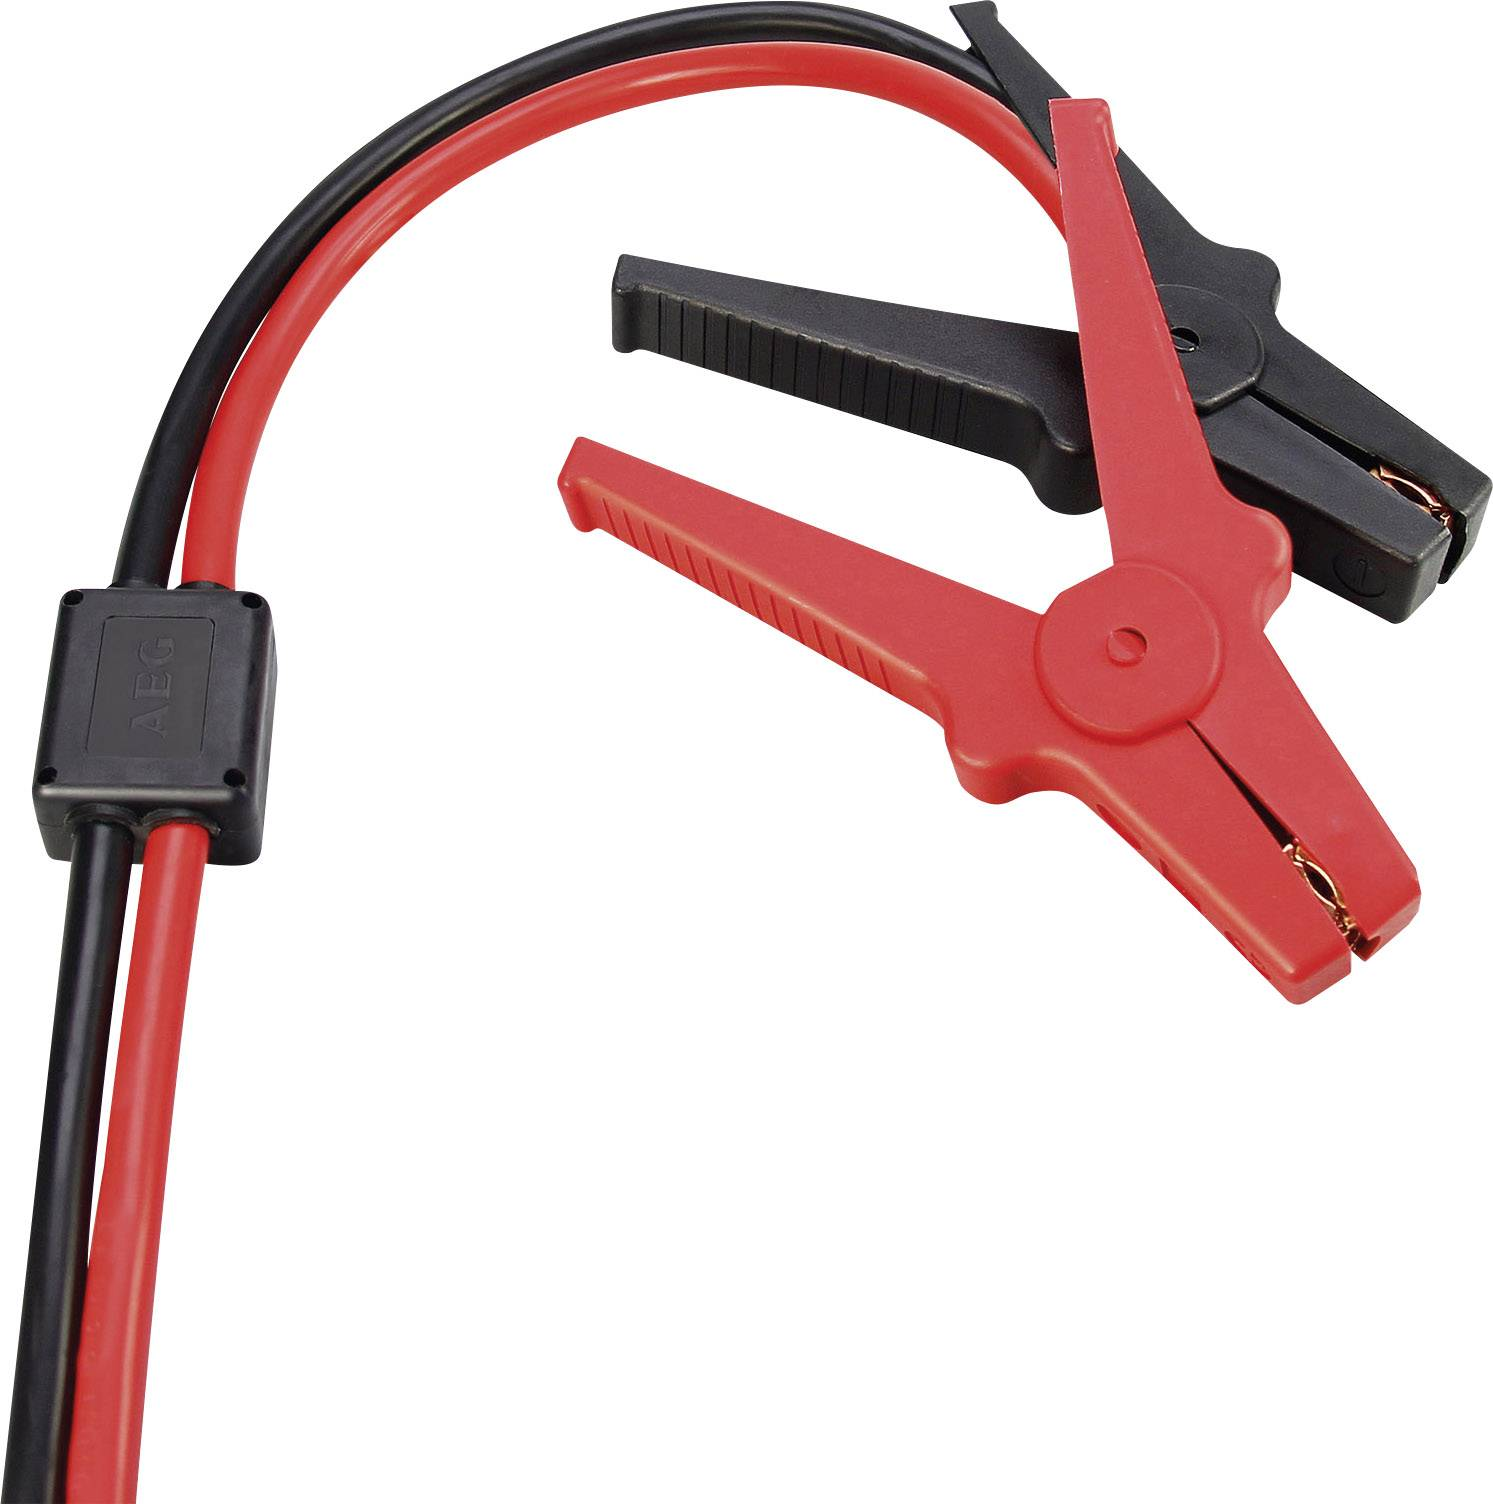 Štartovacie káble AEG SP16, 97215, 20,8 mm²